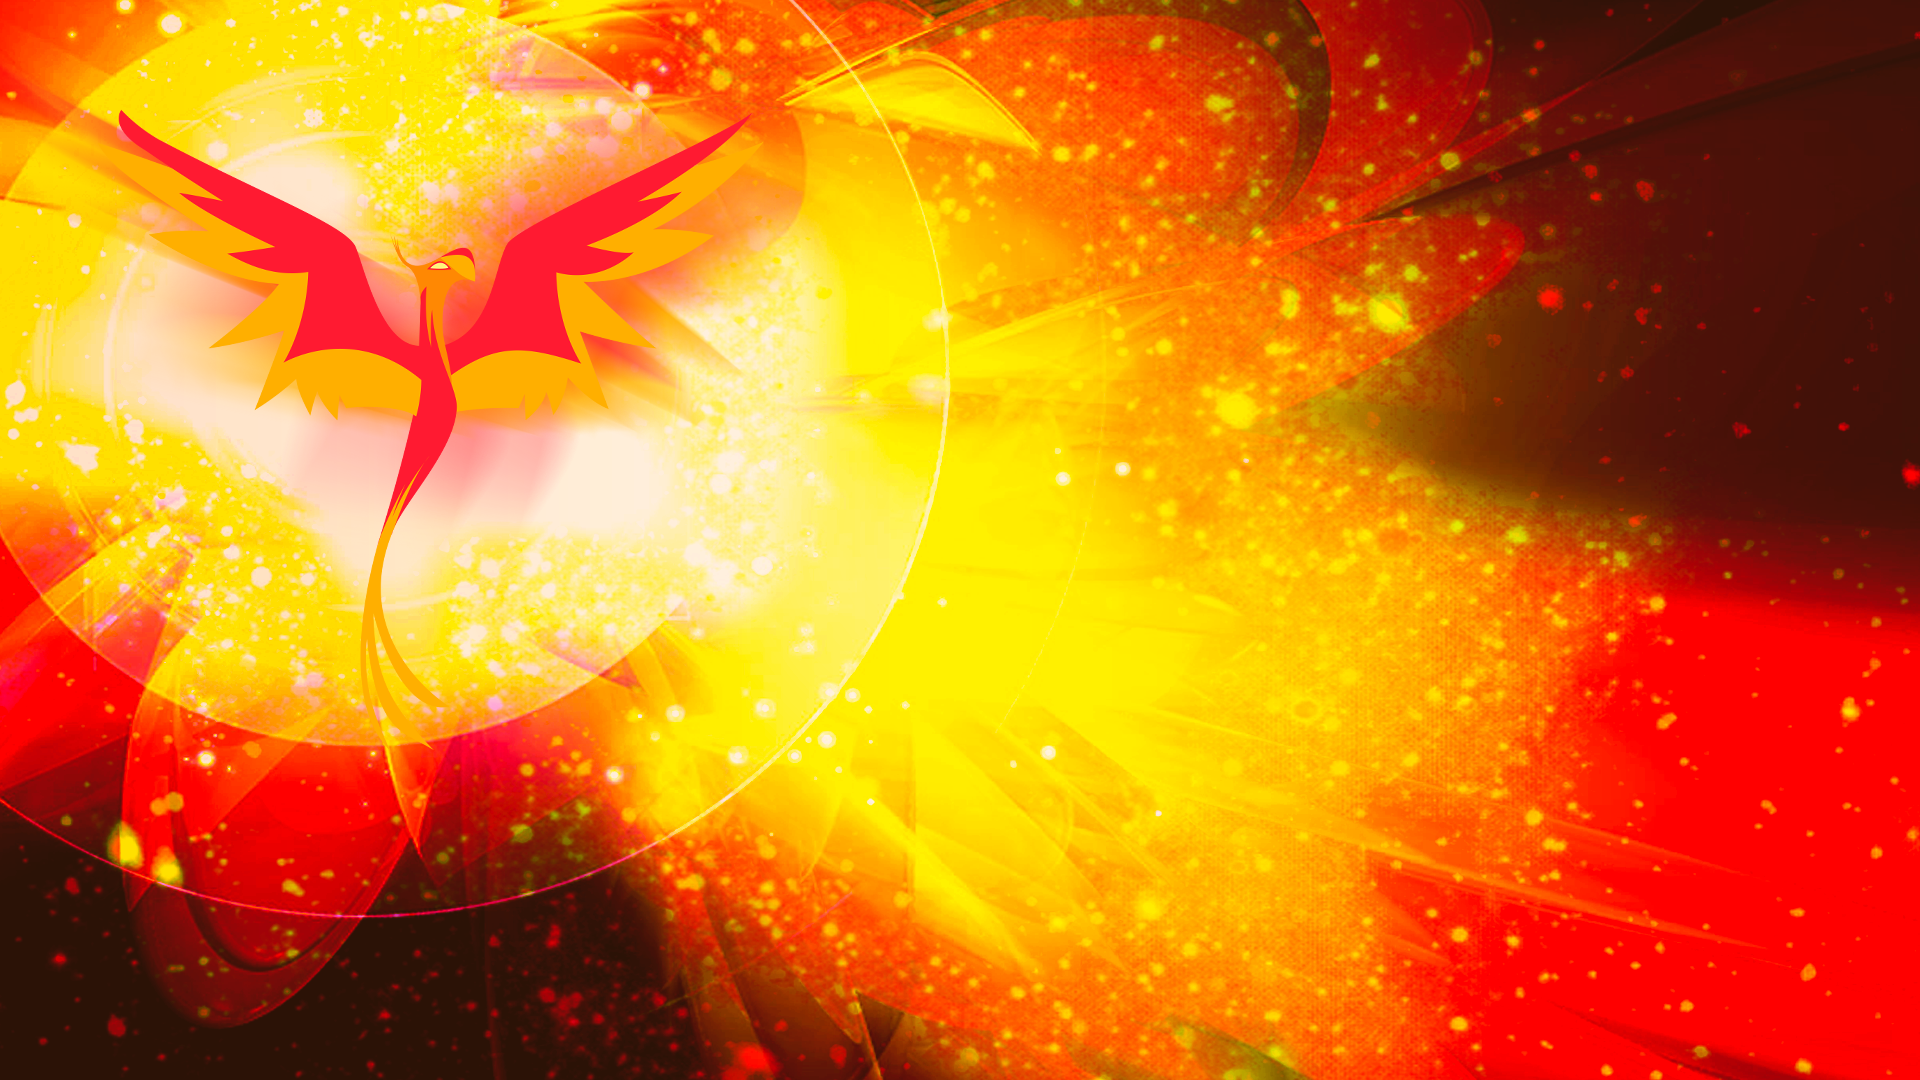 50+ Phoenix Desktop Wallpaper on WallpaperSafari